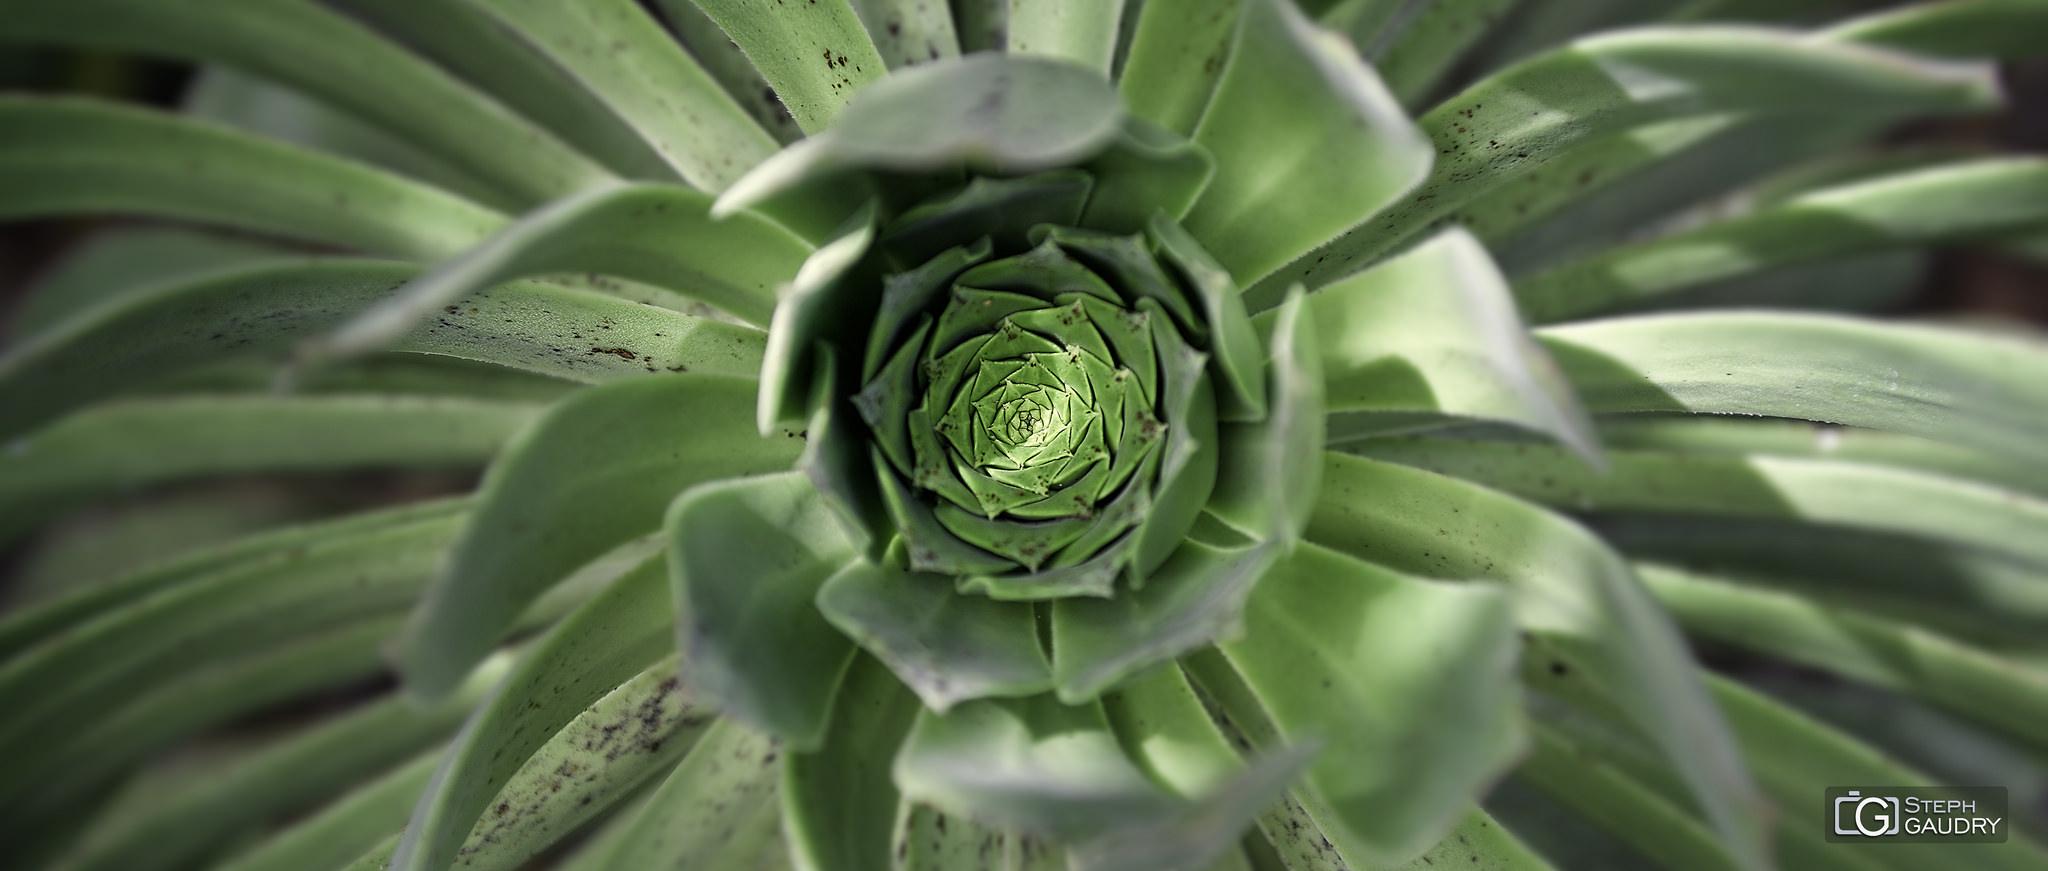 Vortex végétal [Click to start slideshow]